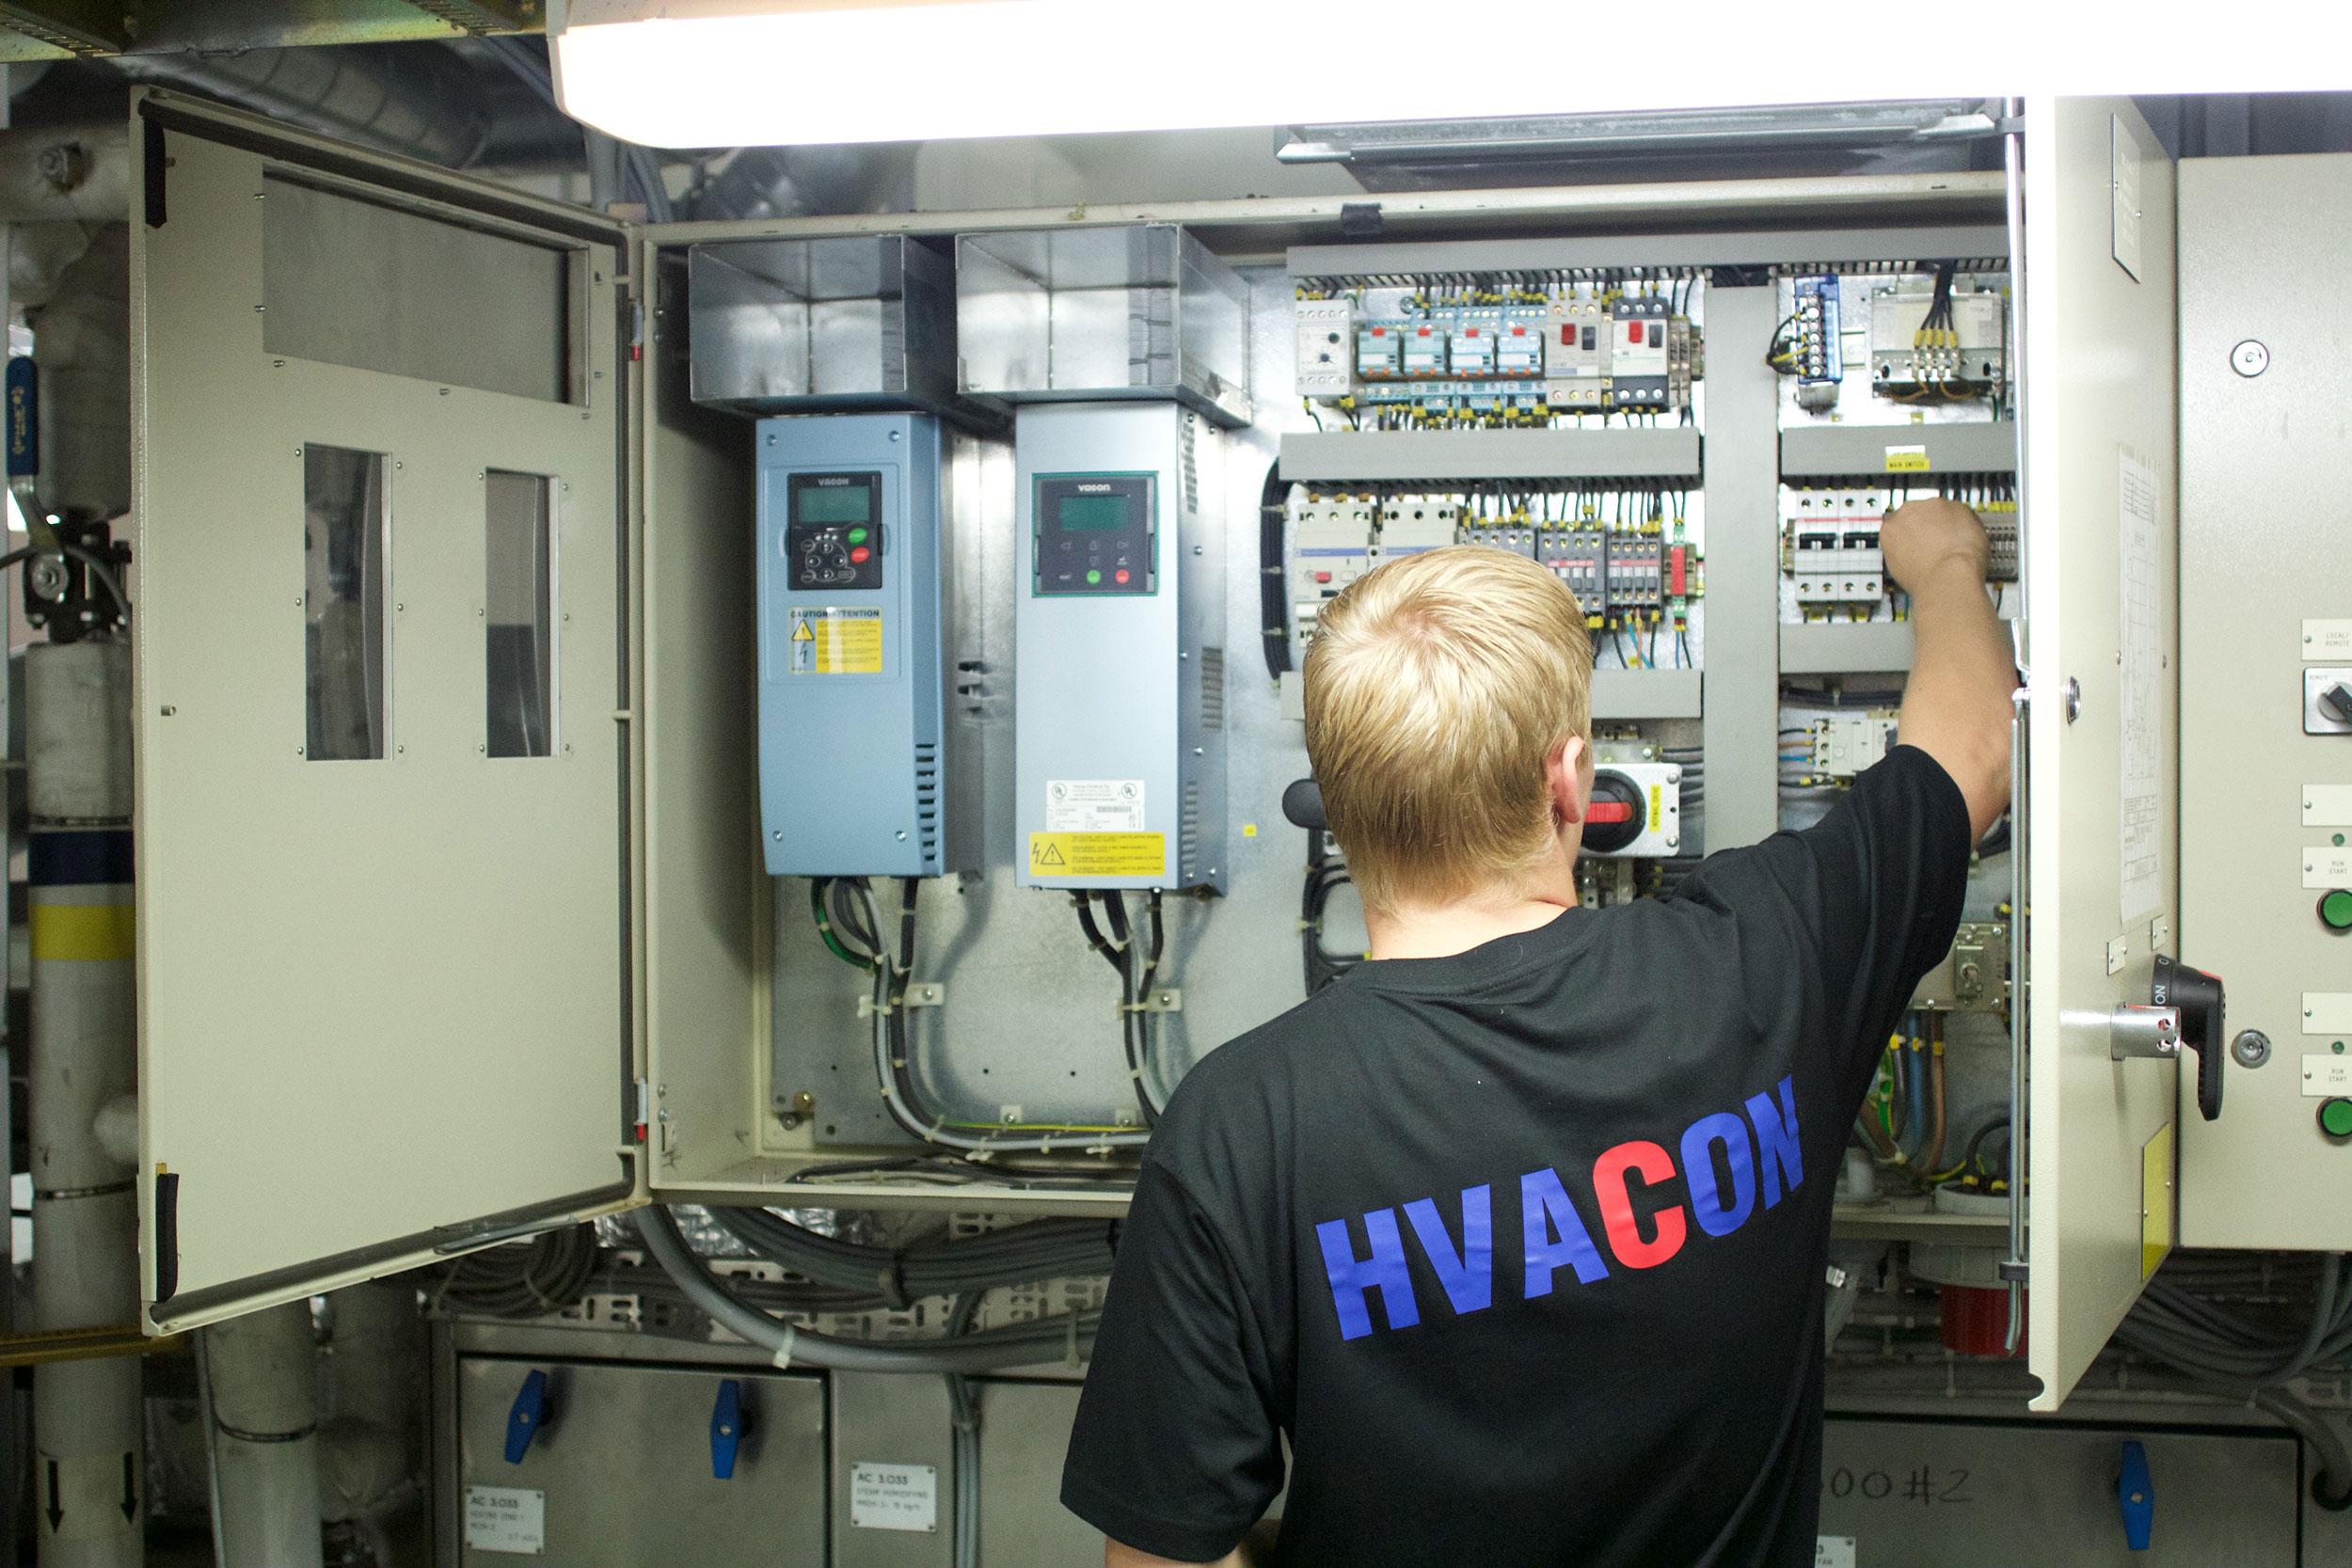 HVAC control energy  optimization and management electrical design  #8D5E3E